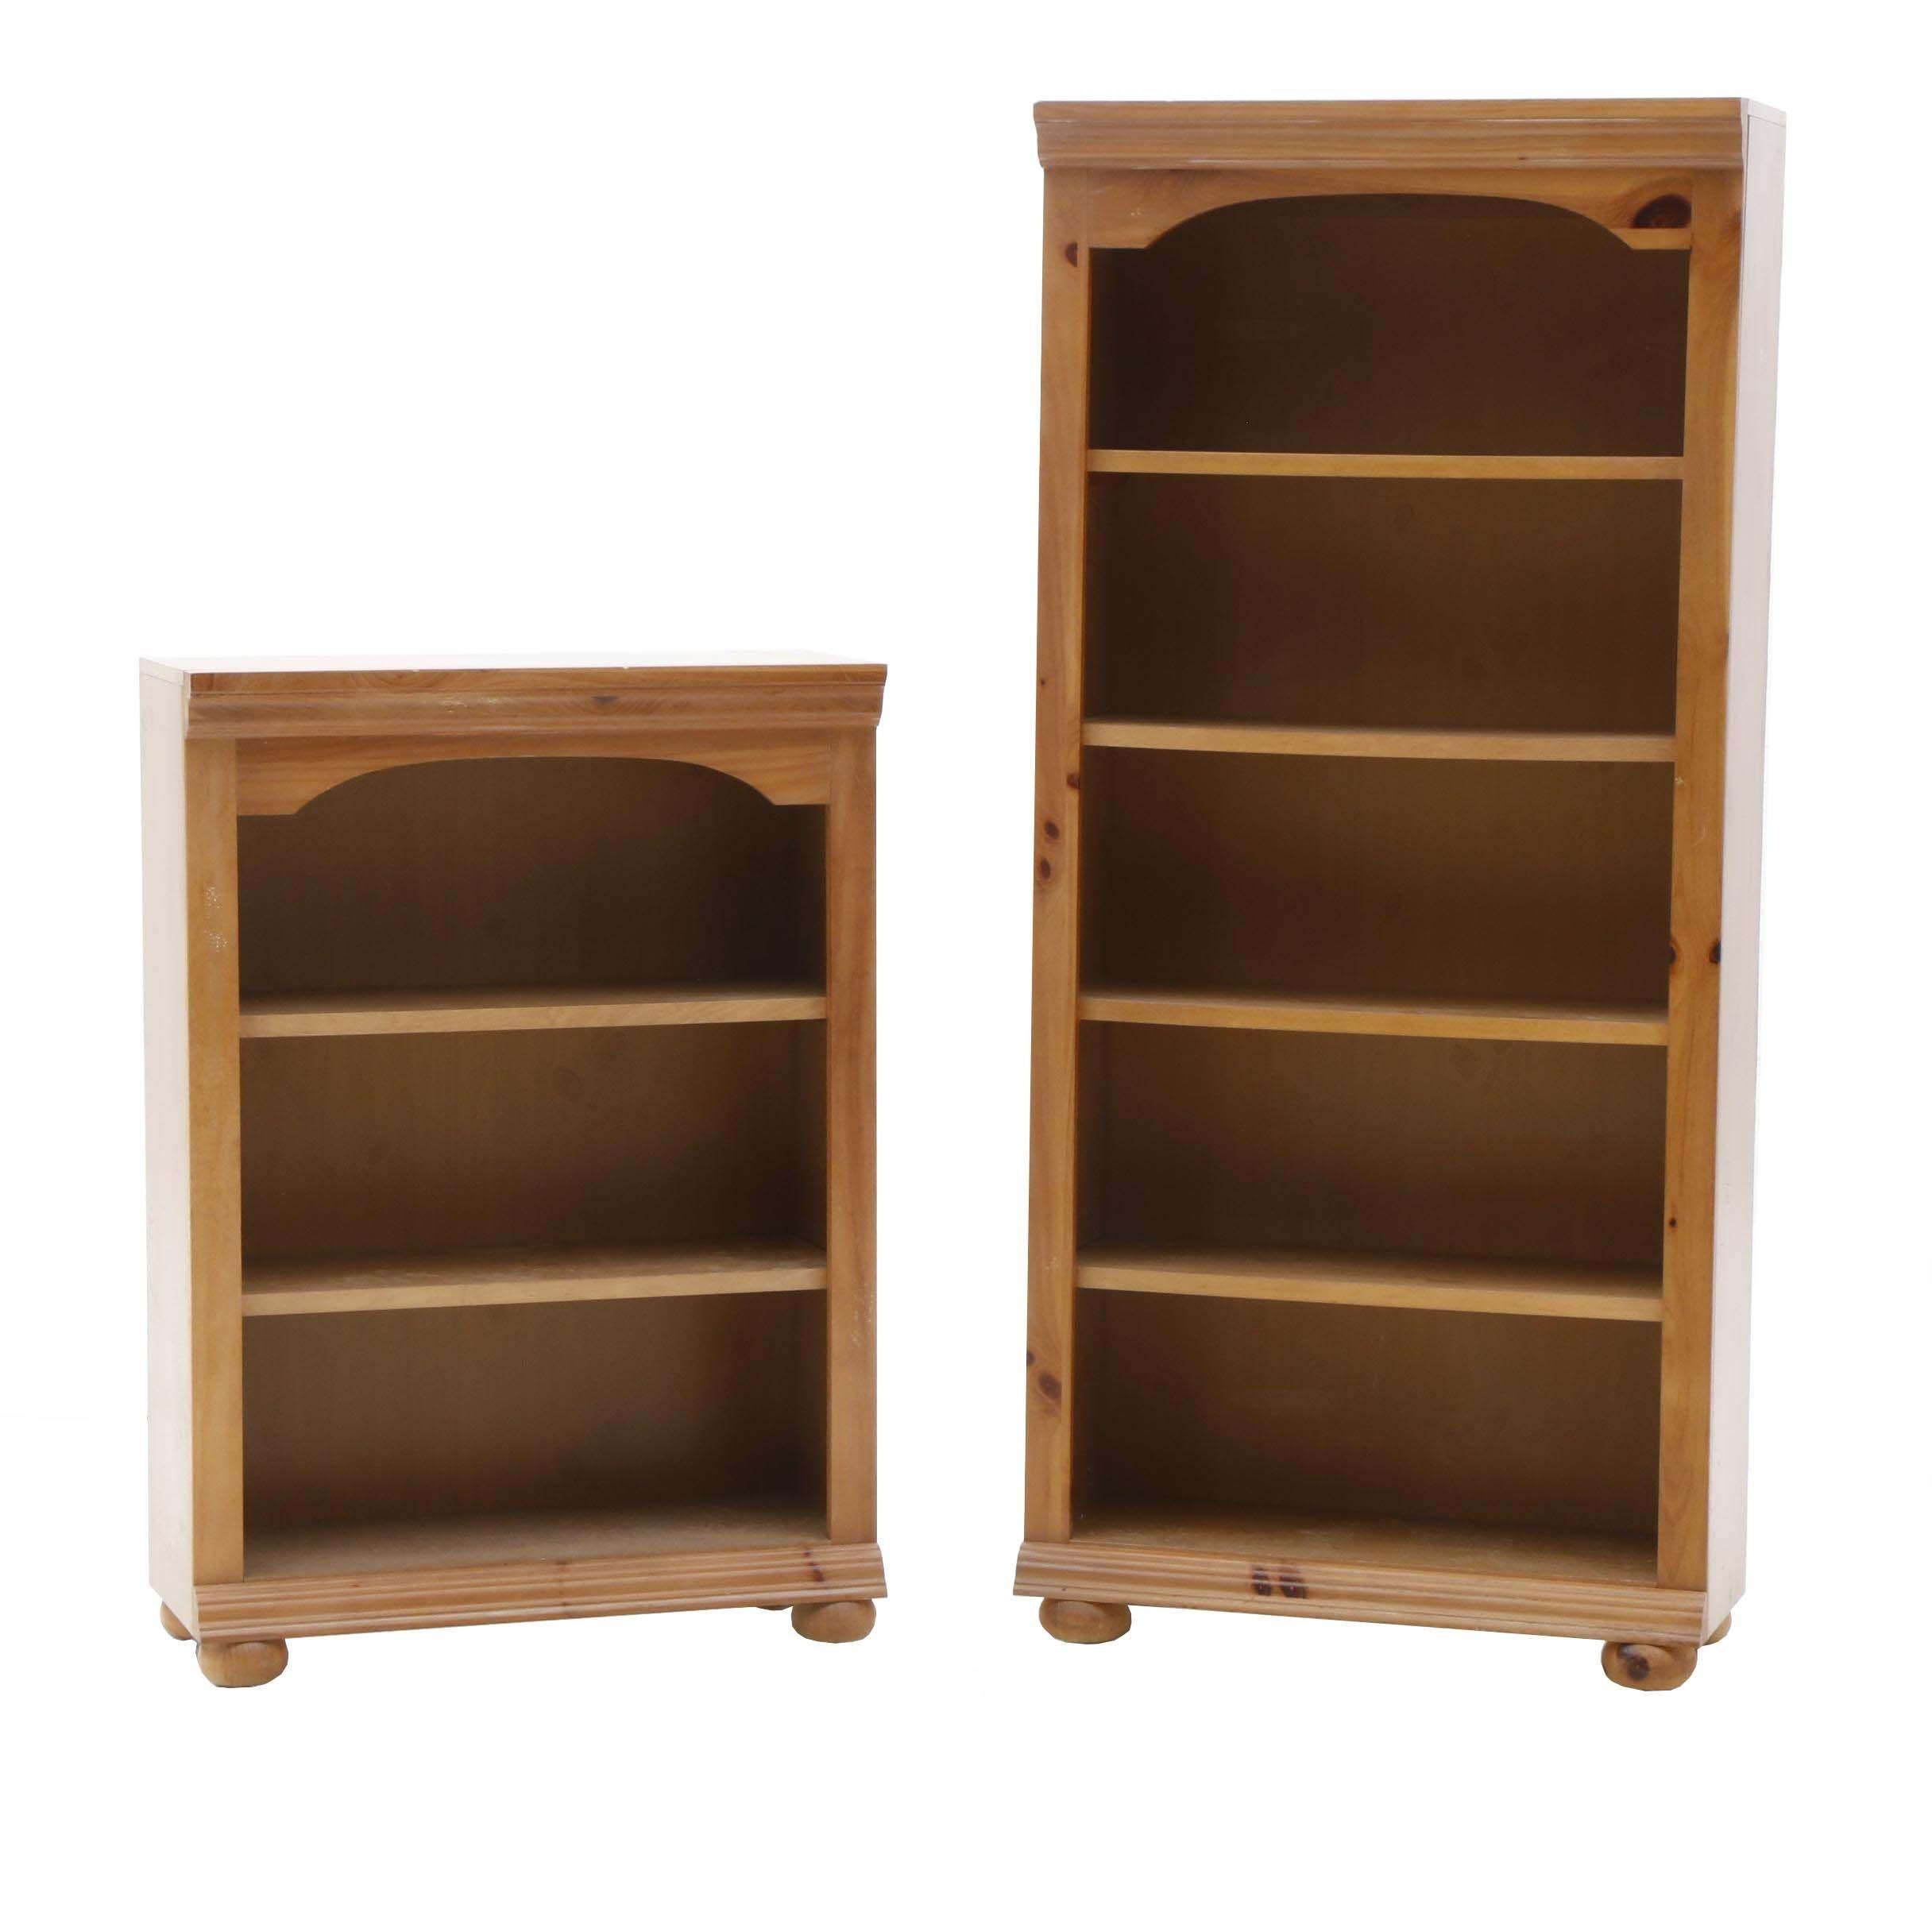 Two Contemporary Pine Bookshelves